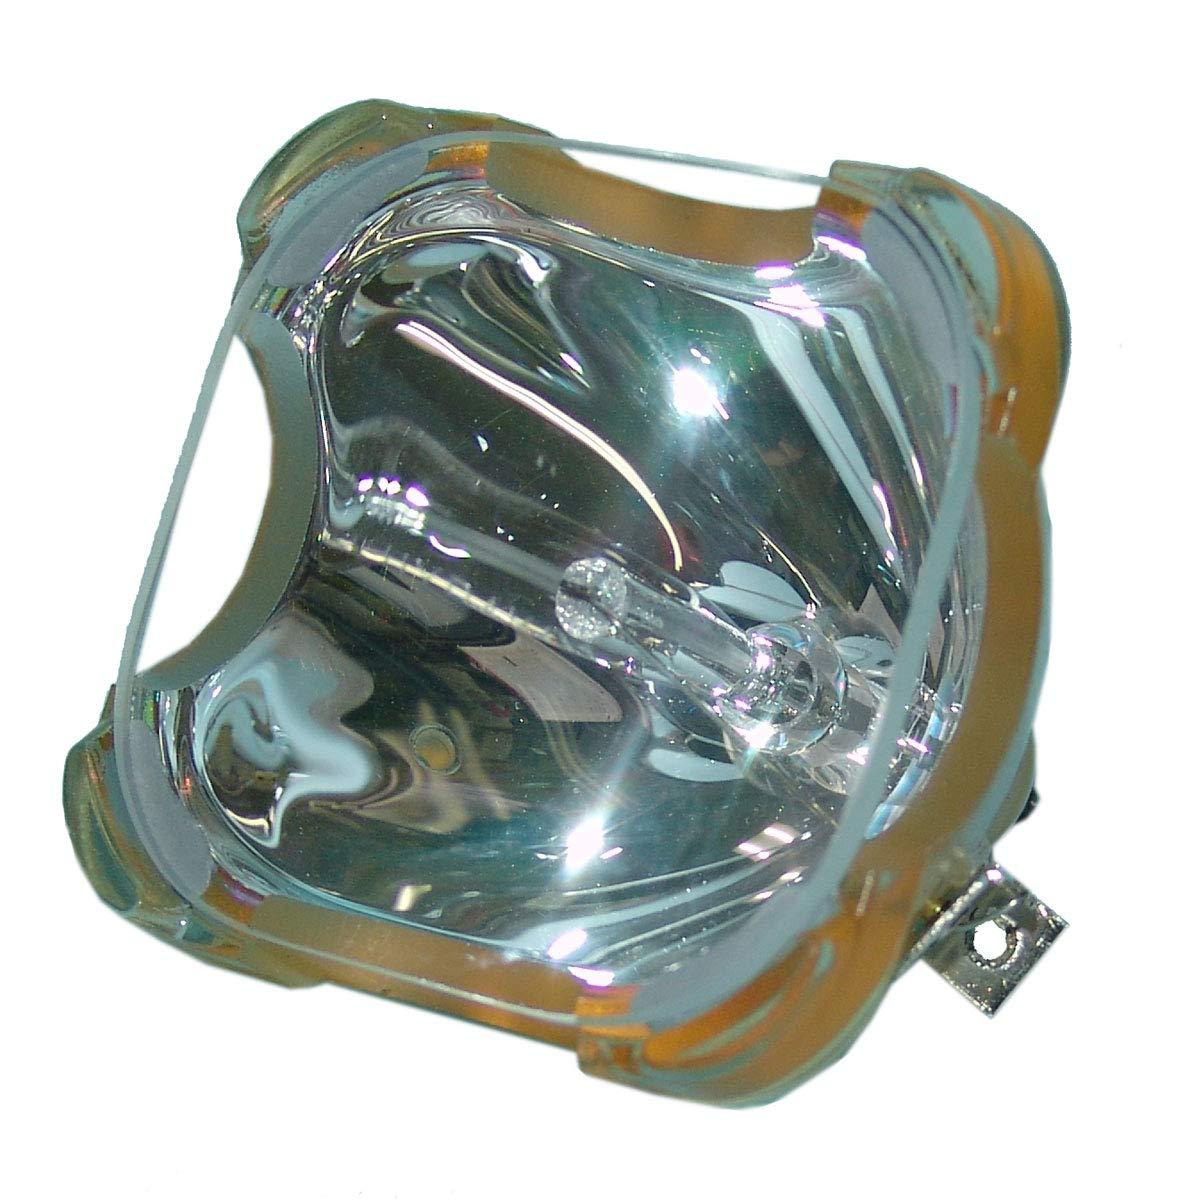 SpArc 交換用ランプ 囲い/電球付き Barco iCon H250用 Economy Economy Lamp Only B07MPWCT82